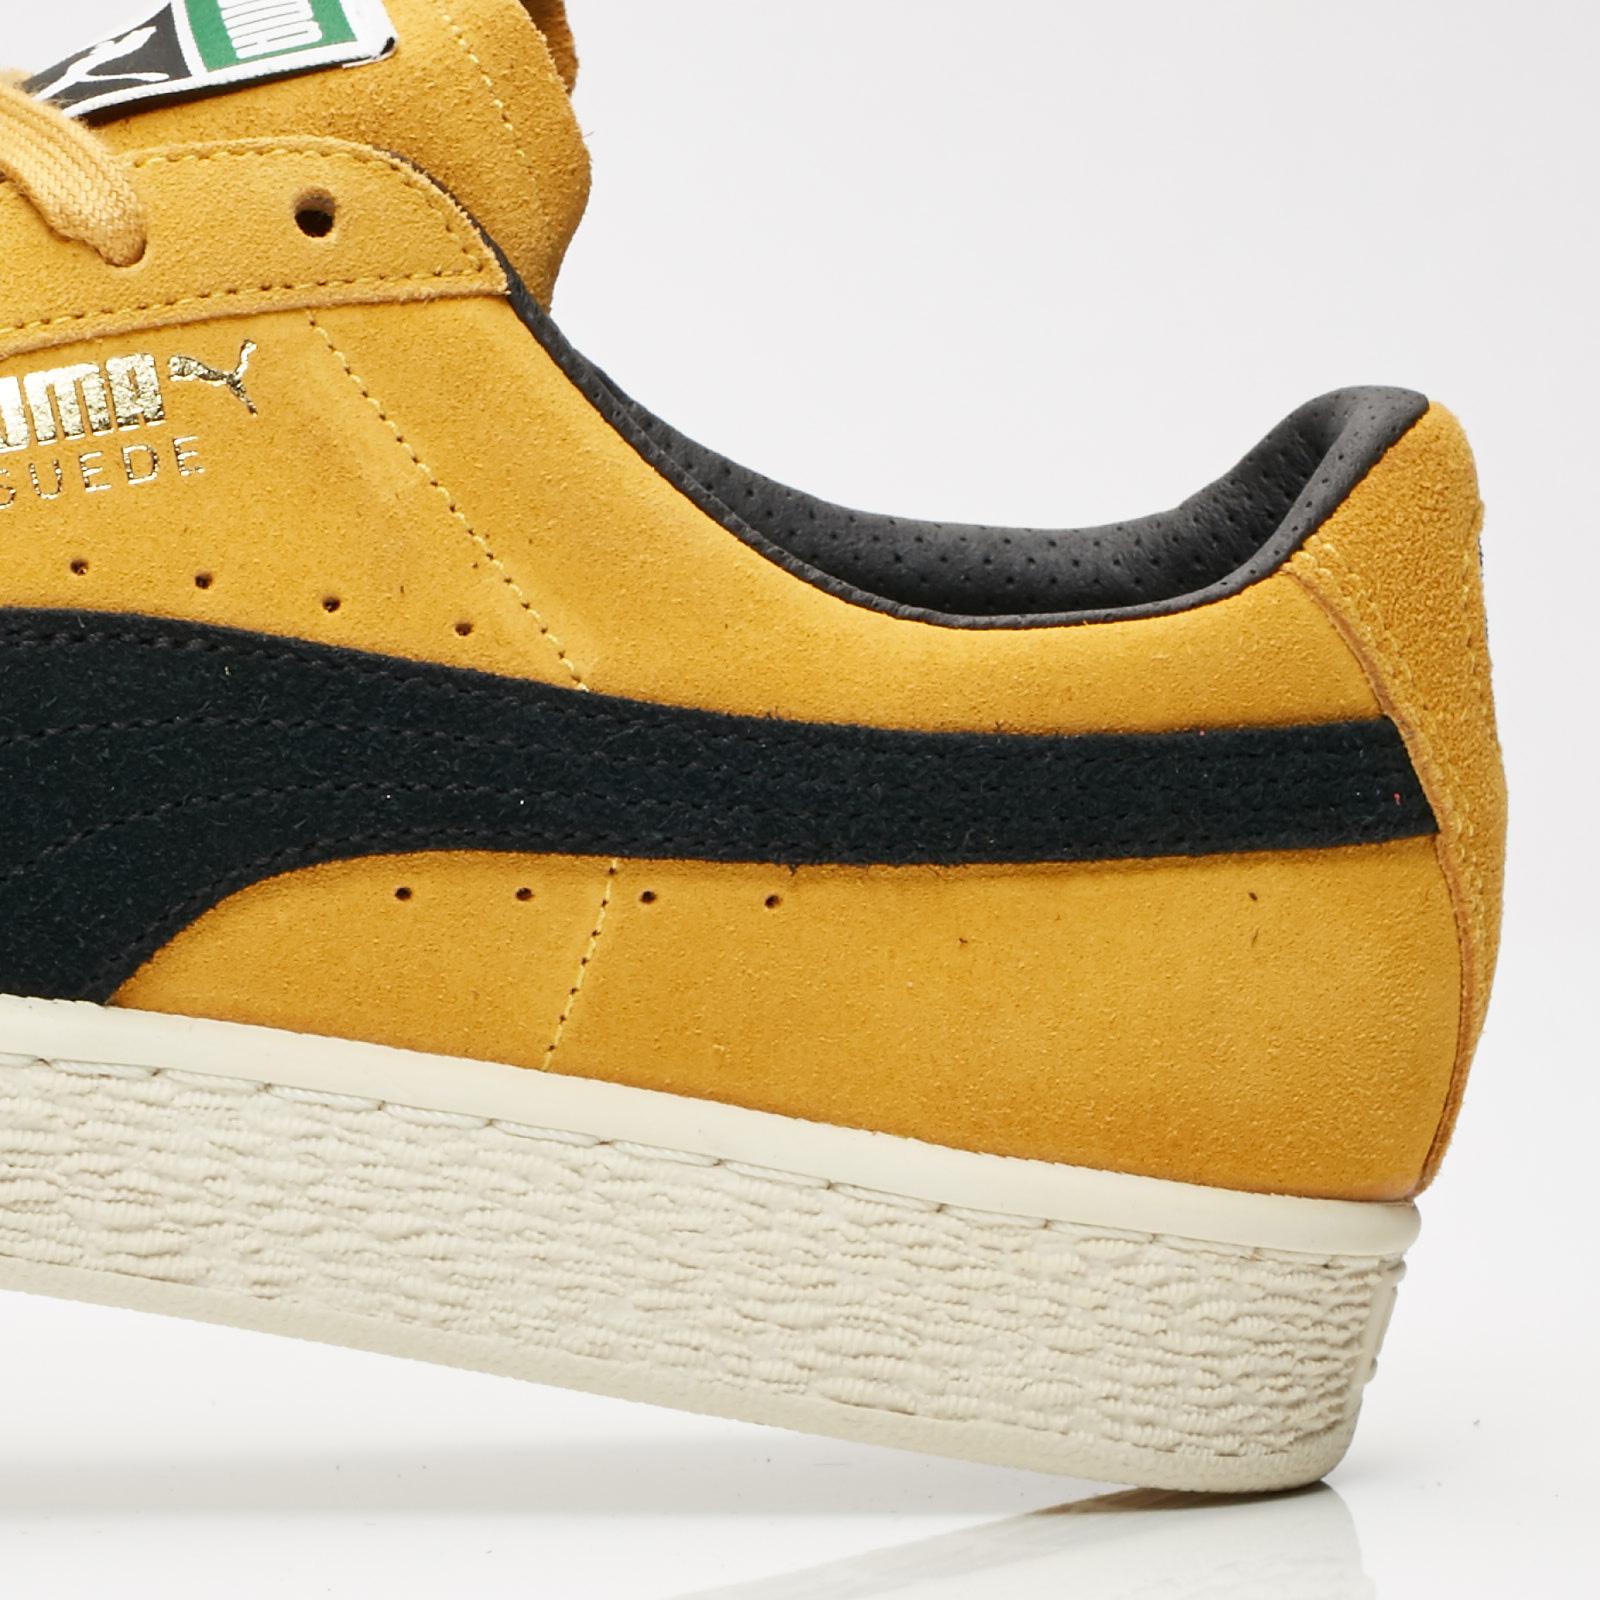 46c4aae1634697 Puma Suede Classic Archive - 365587-03 - Sneakersnstuff